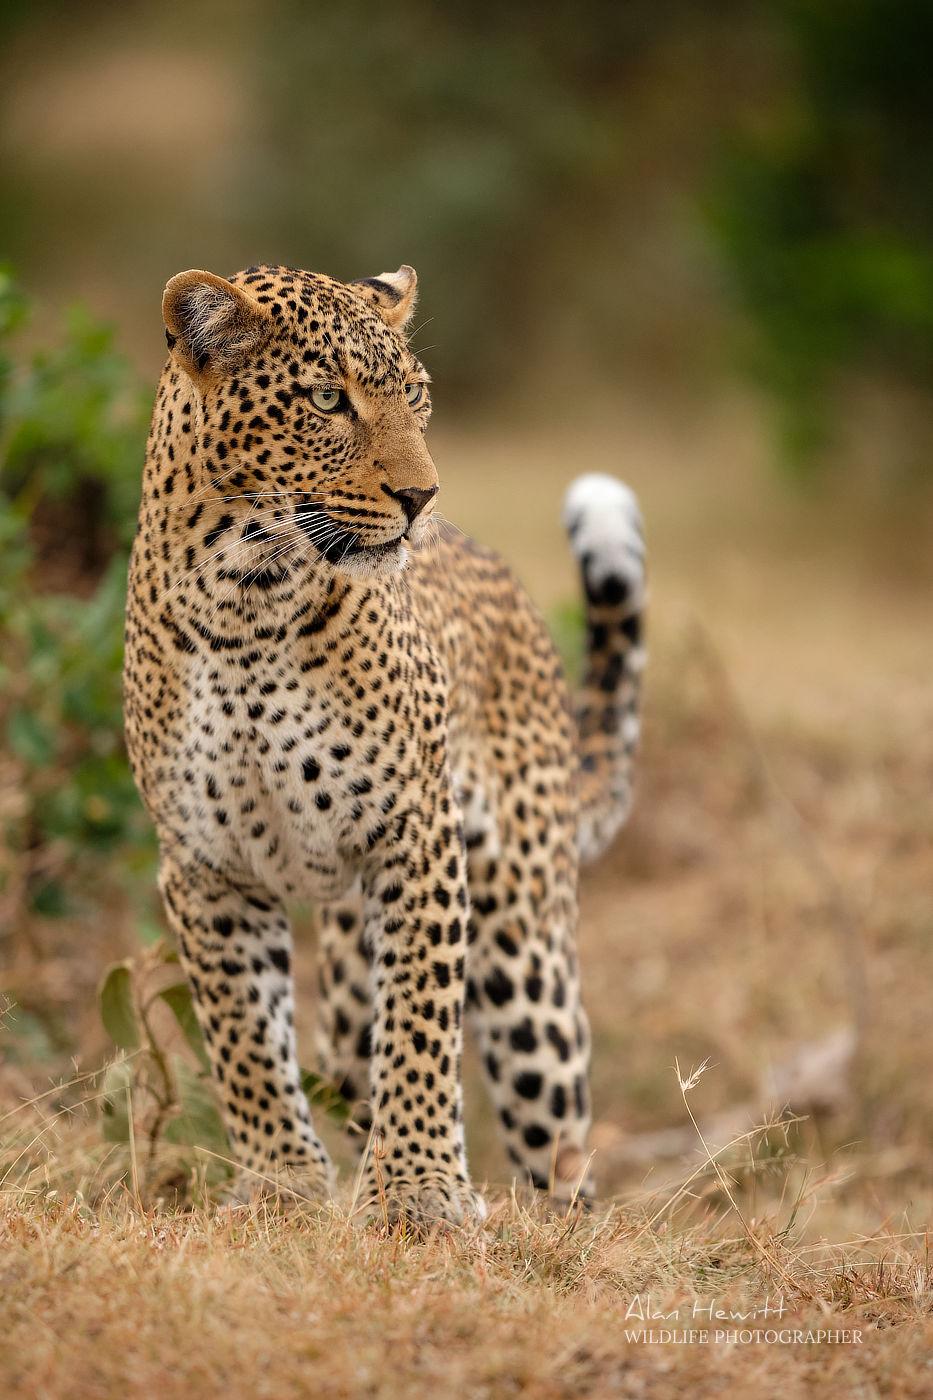 Leopard Maasai Mara African Photography Safari Alan Hewitt